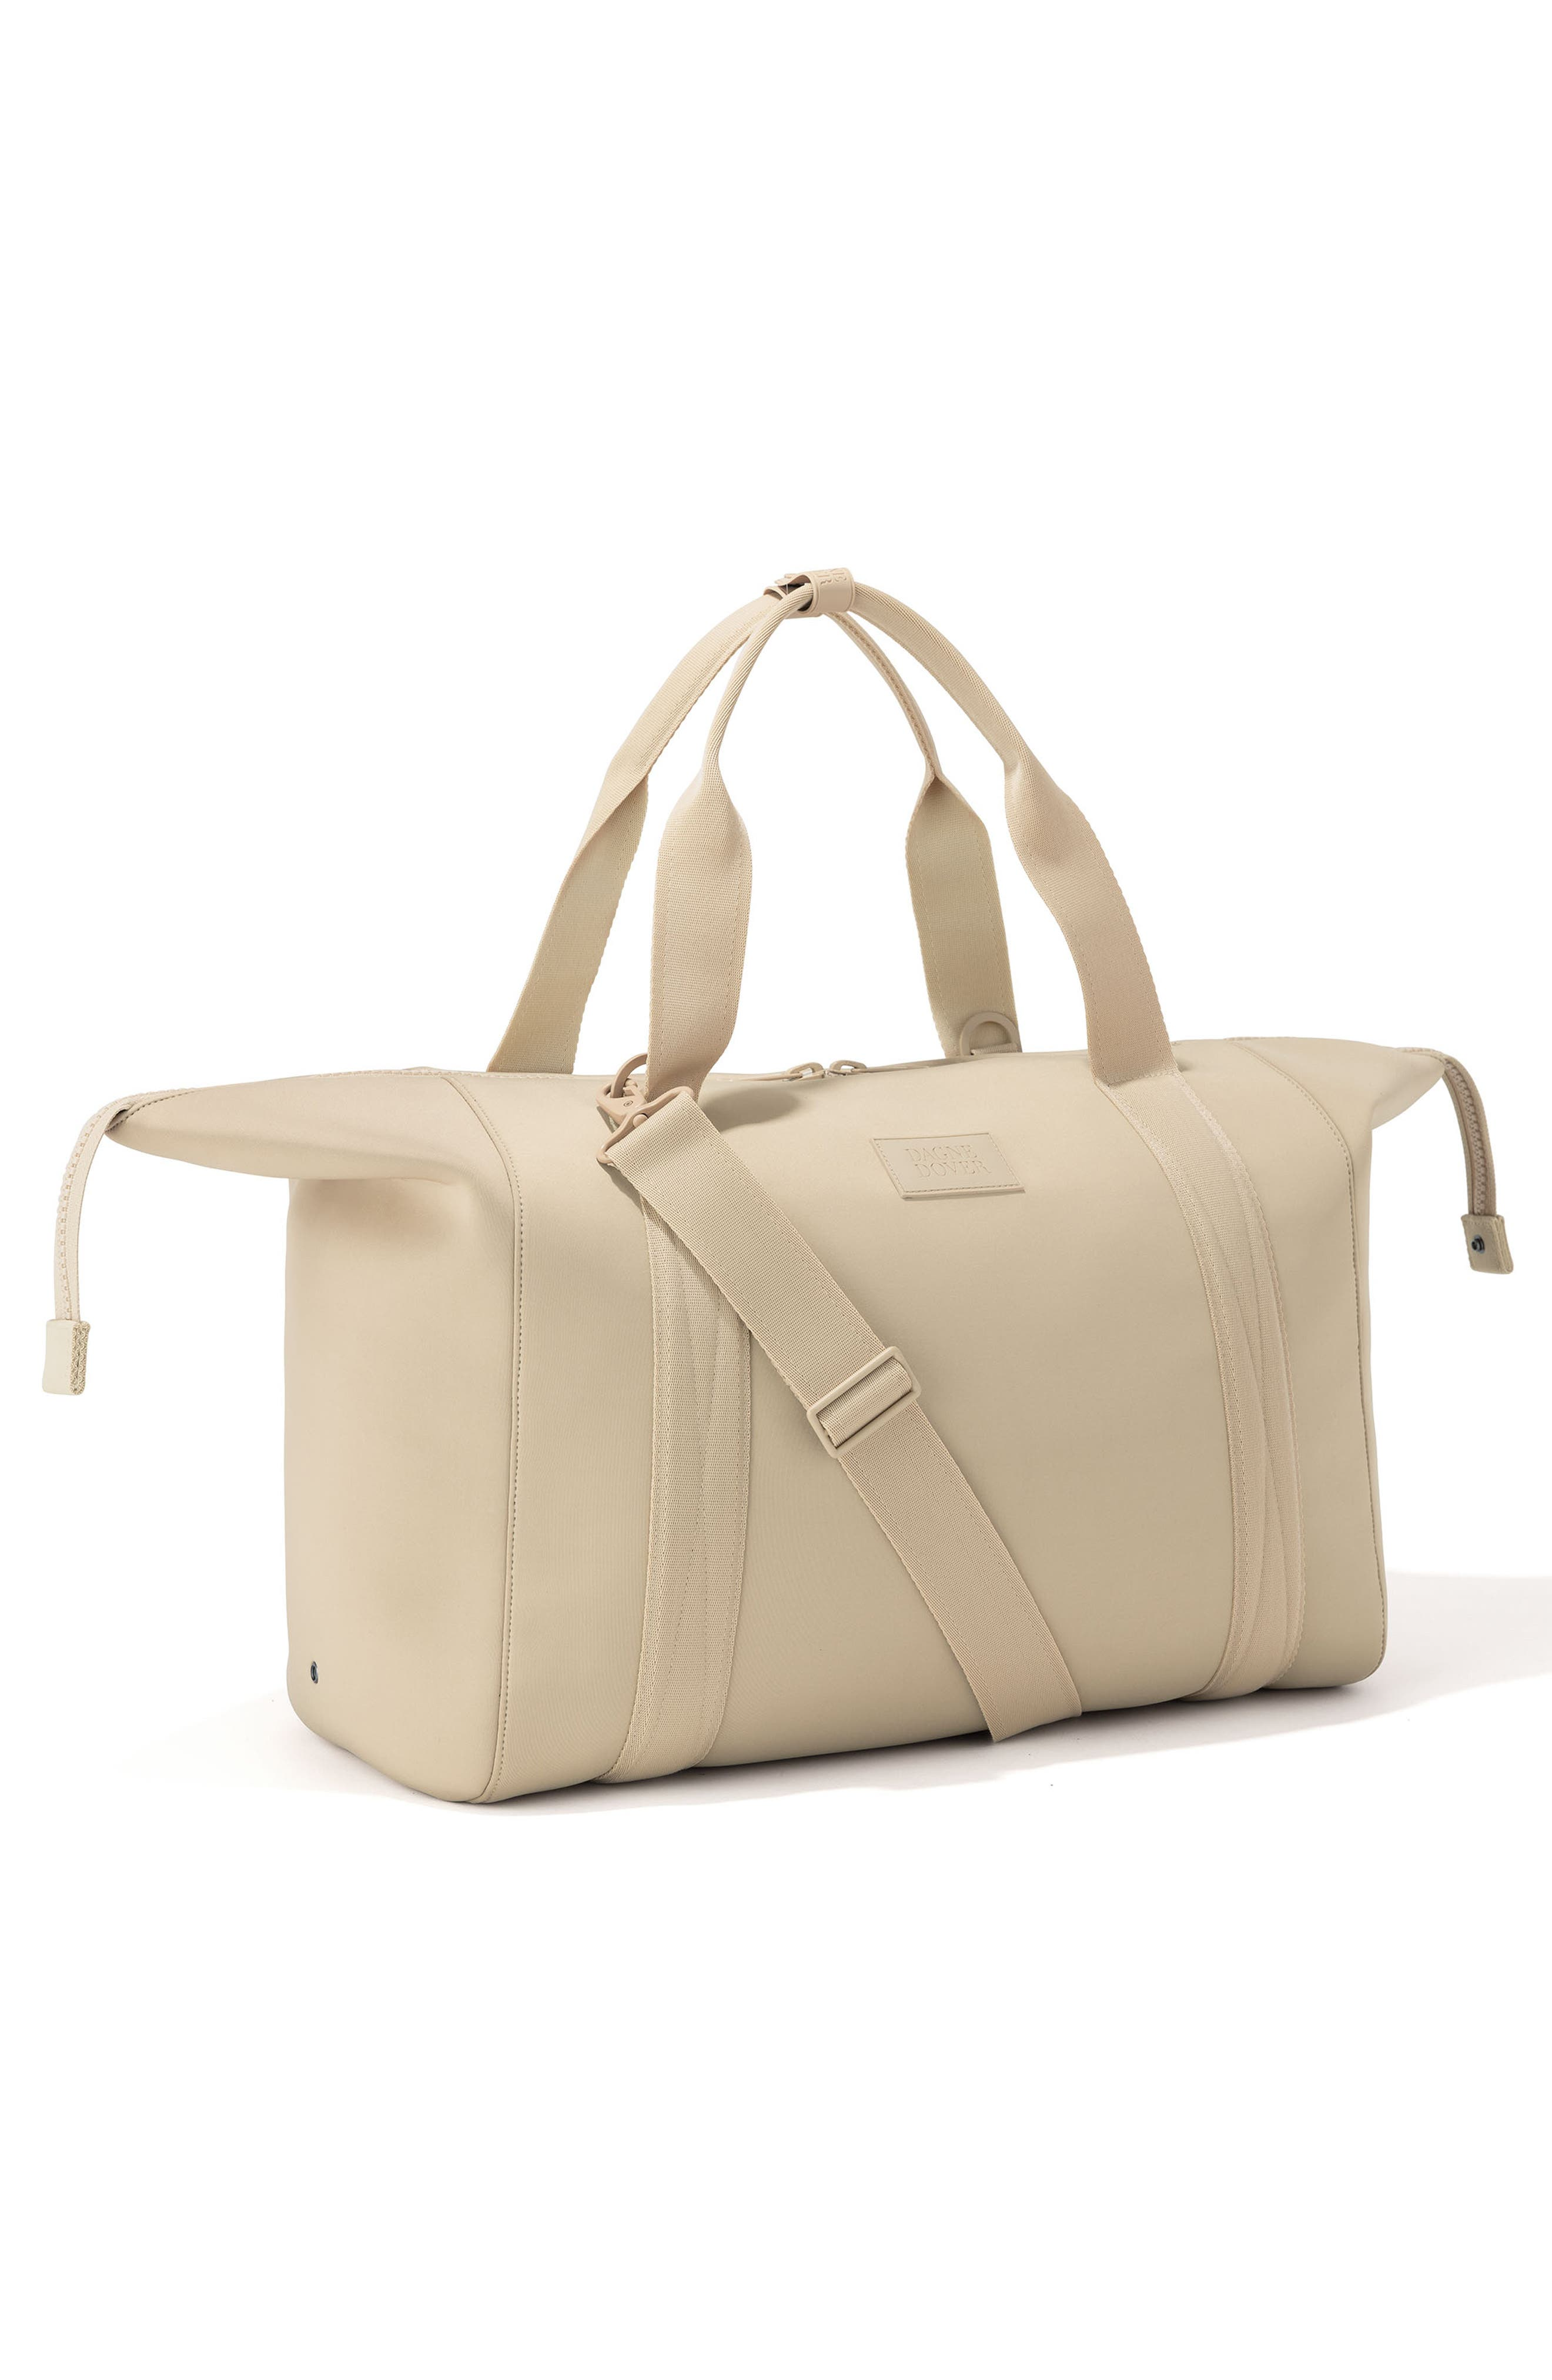 DAGNE DOVER, XL Landon Carryall Duffle Bag, Alternate thumbnail 5, color, ALMOND LATTE